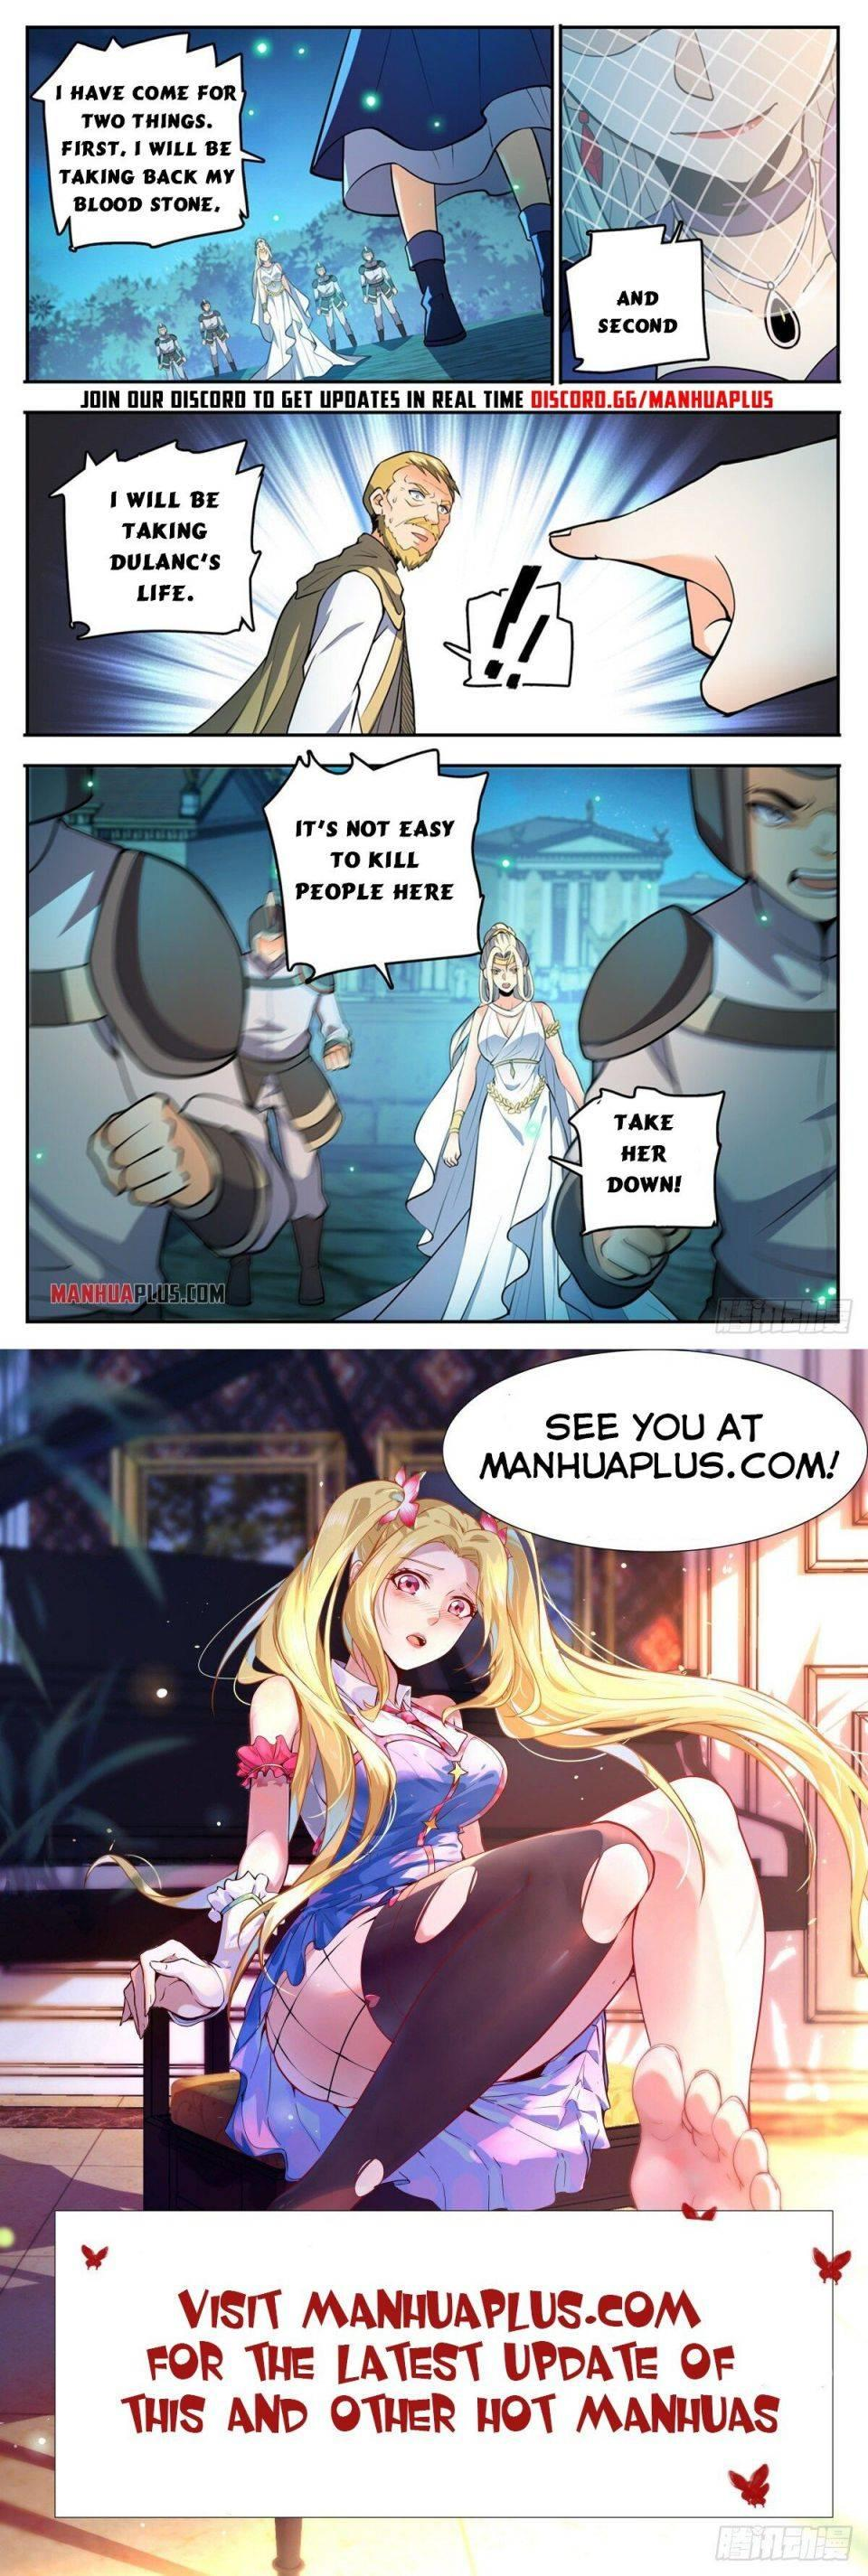 Versatile Mage Chapter 754 page 12 - Mangakakalot